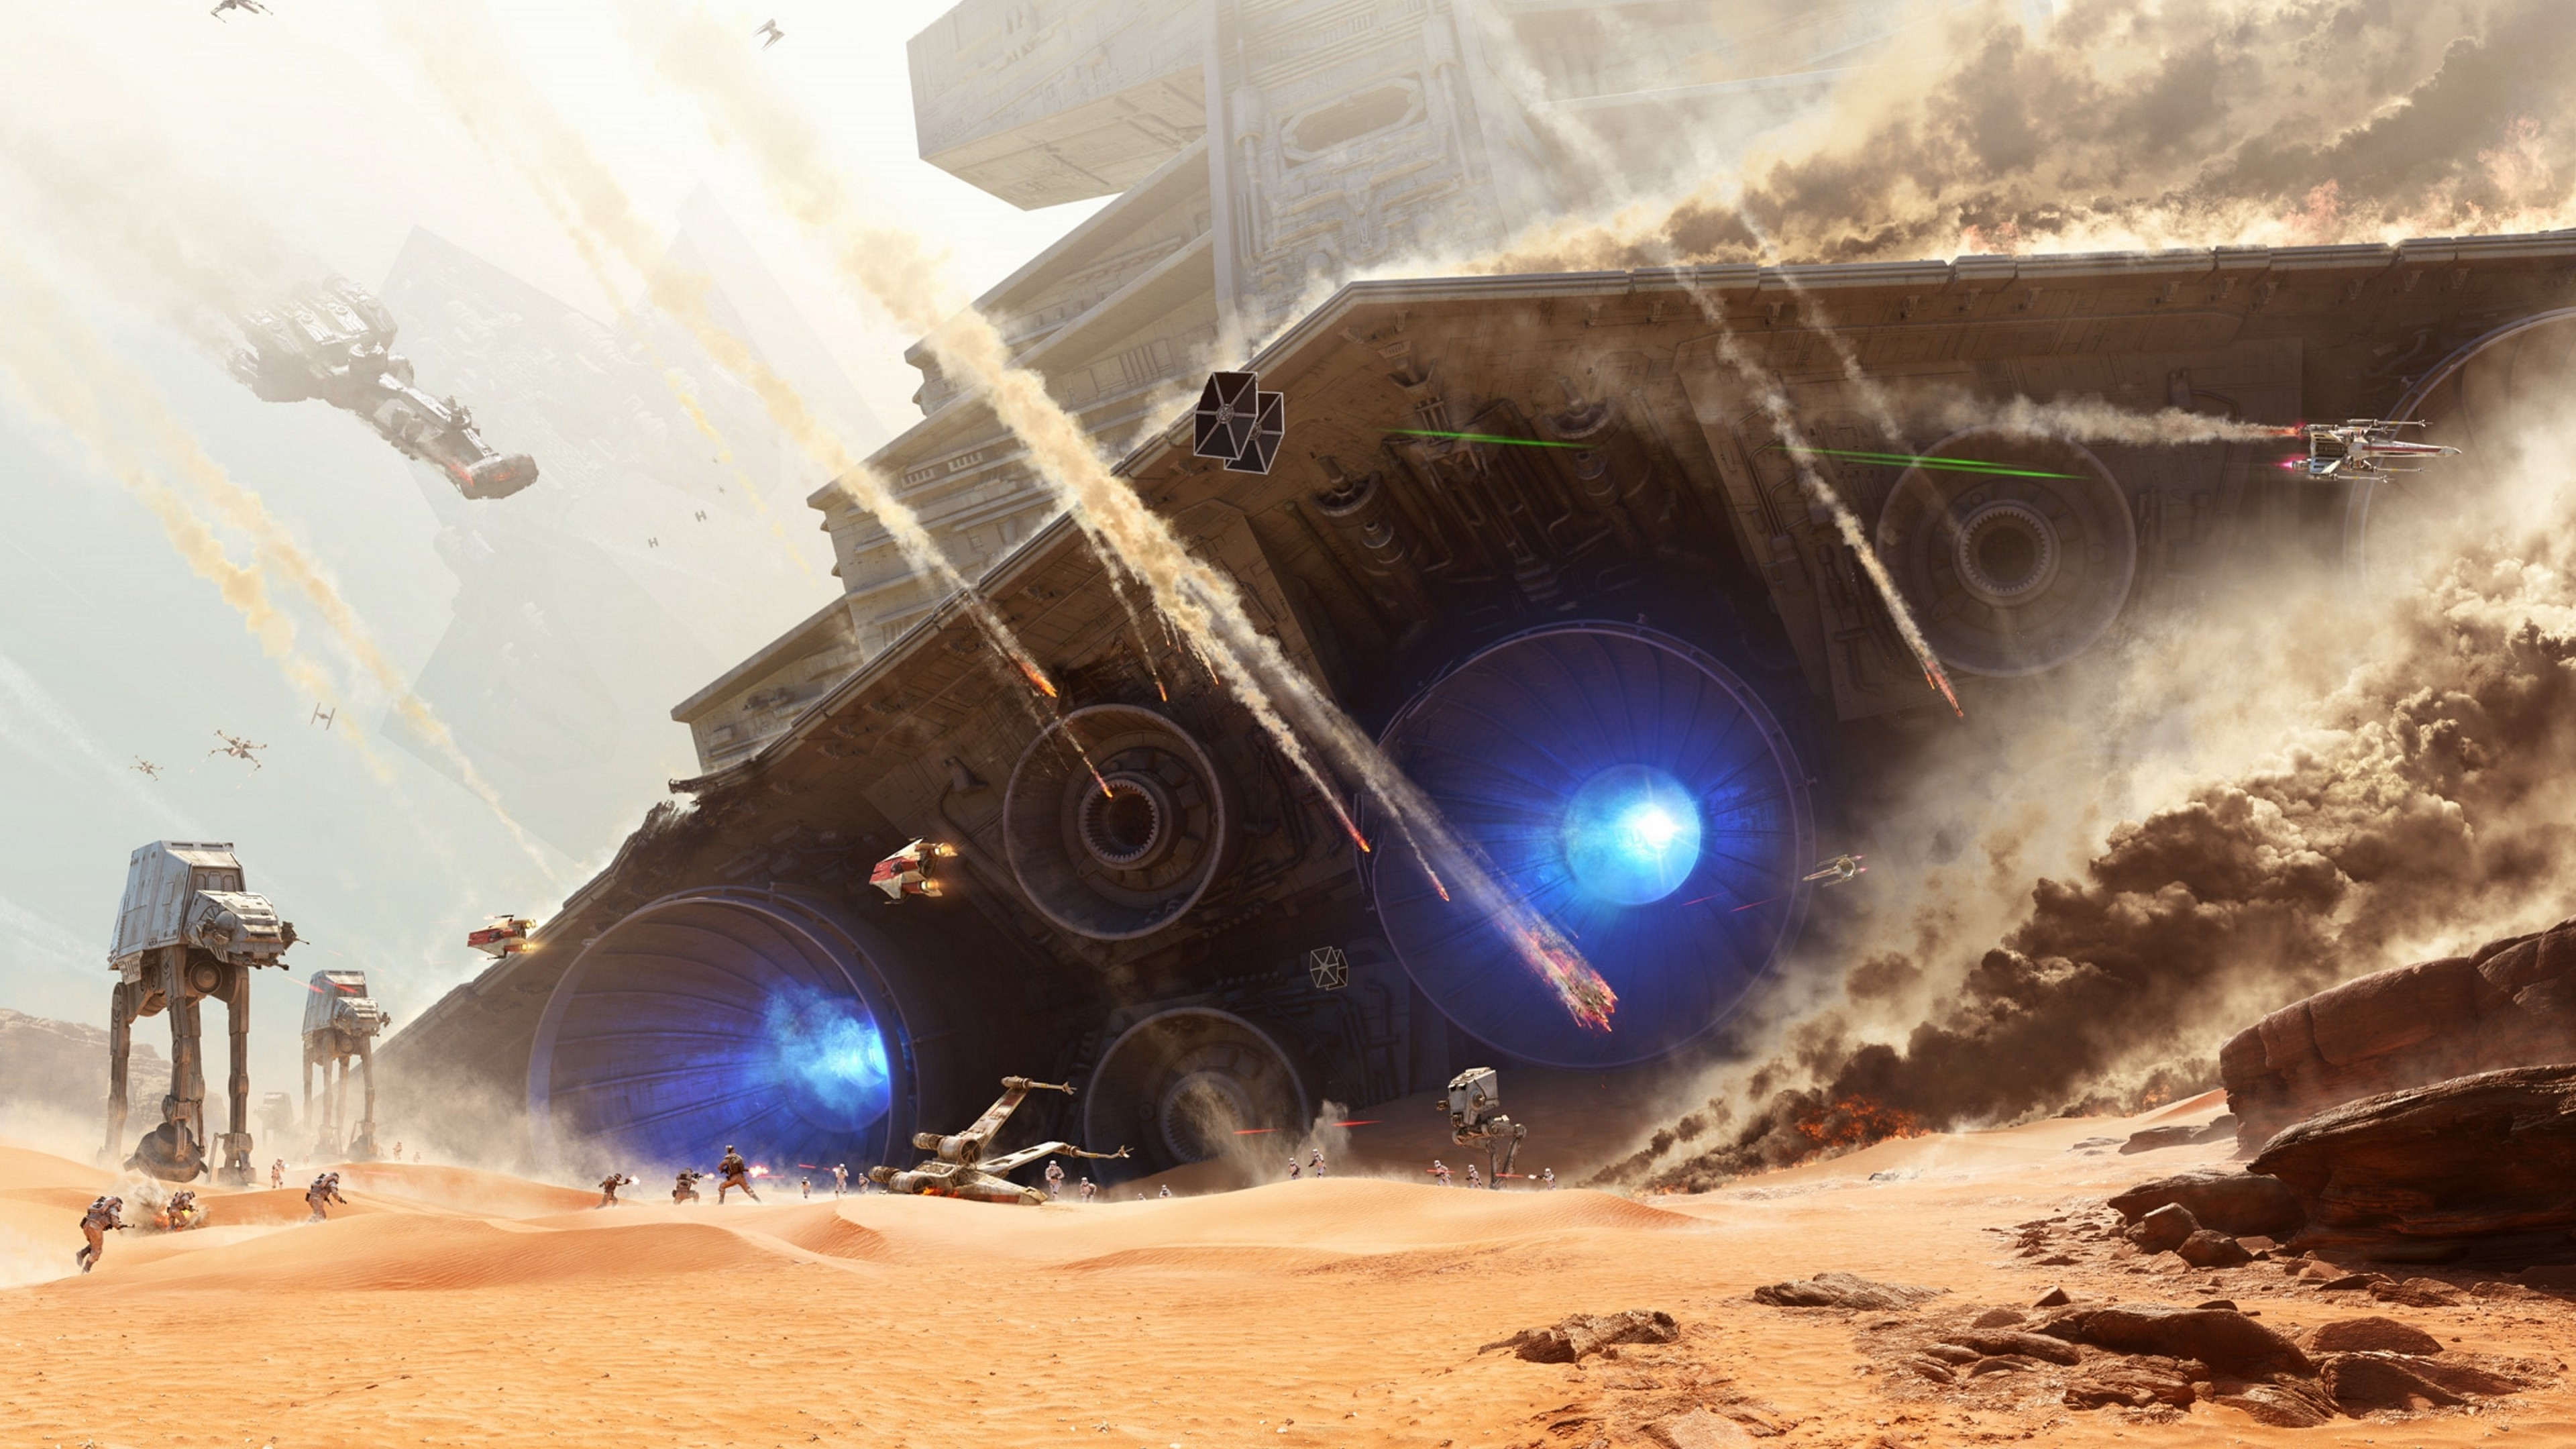 Star Wars, Star Wars: Battlefront, EA DICE, Video Games, Battle, AT AT, AT  ST, TIE Fighter, Soldier, Star Destroyer, X wing, Desert Wallpapers HD /  Desktop …